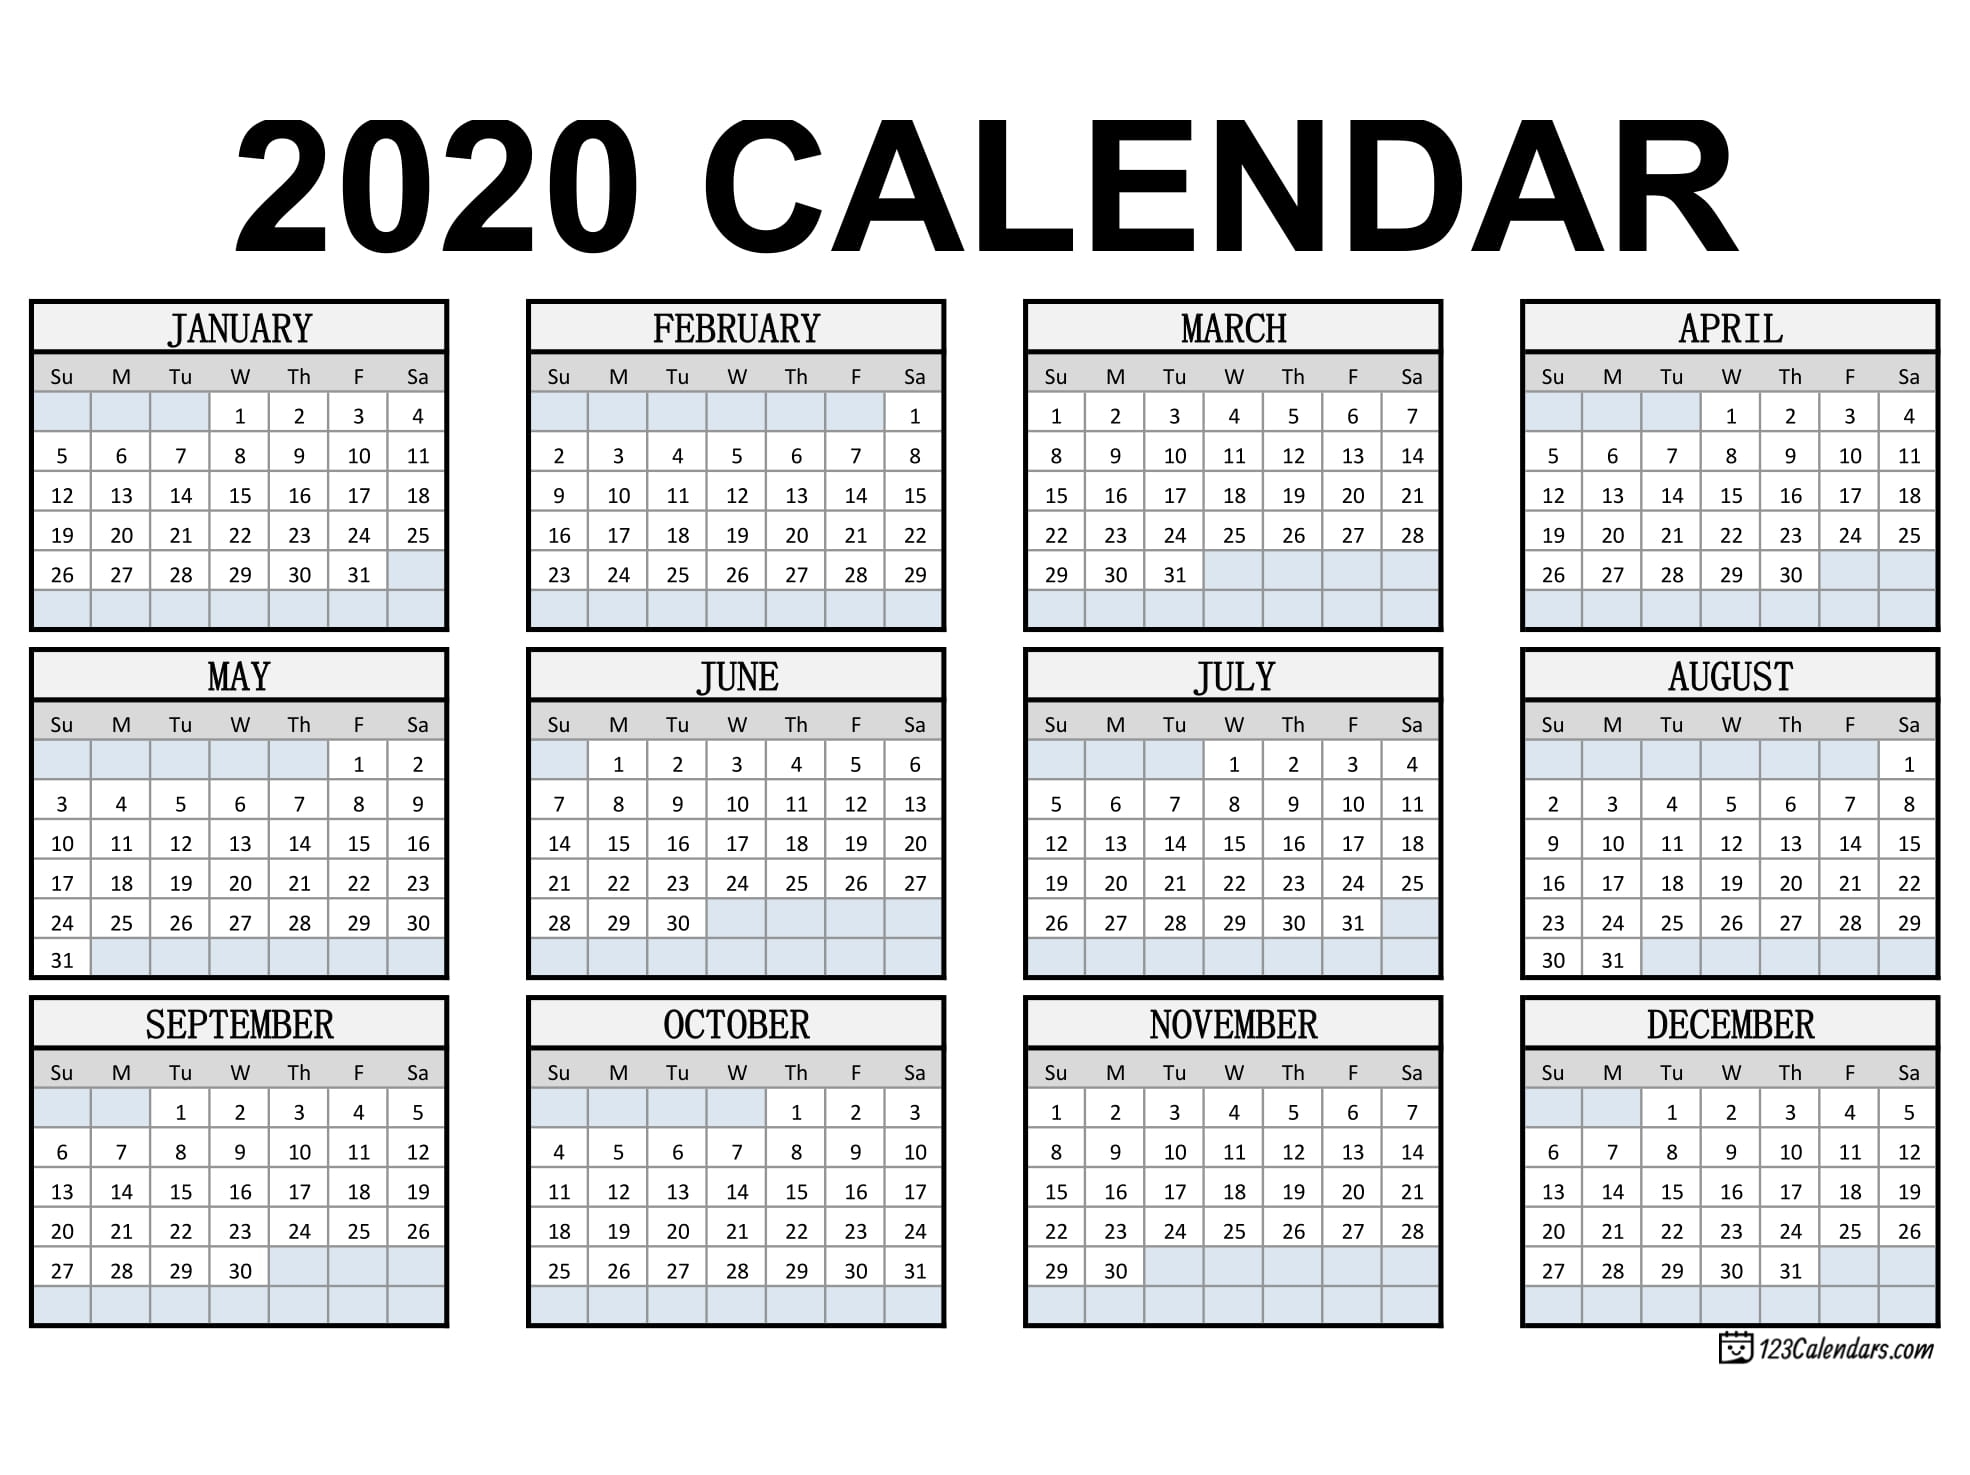 Free Printable 2020 Calendar | 123Calendars with regard to Template For Pocket Sized Calendar